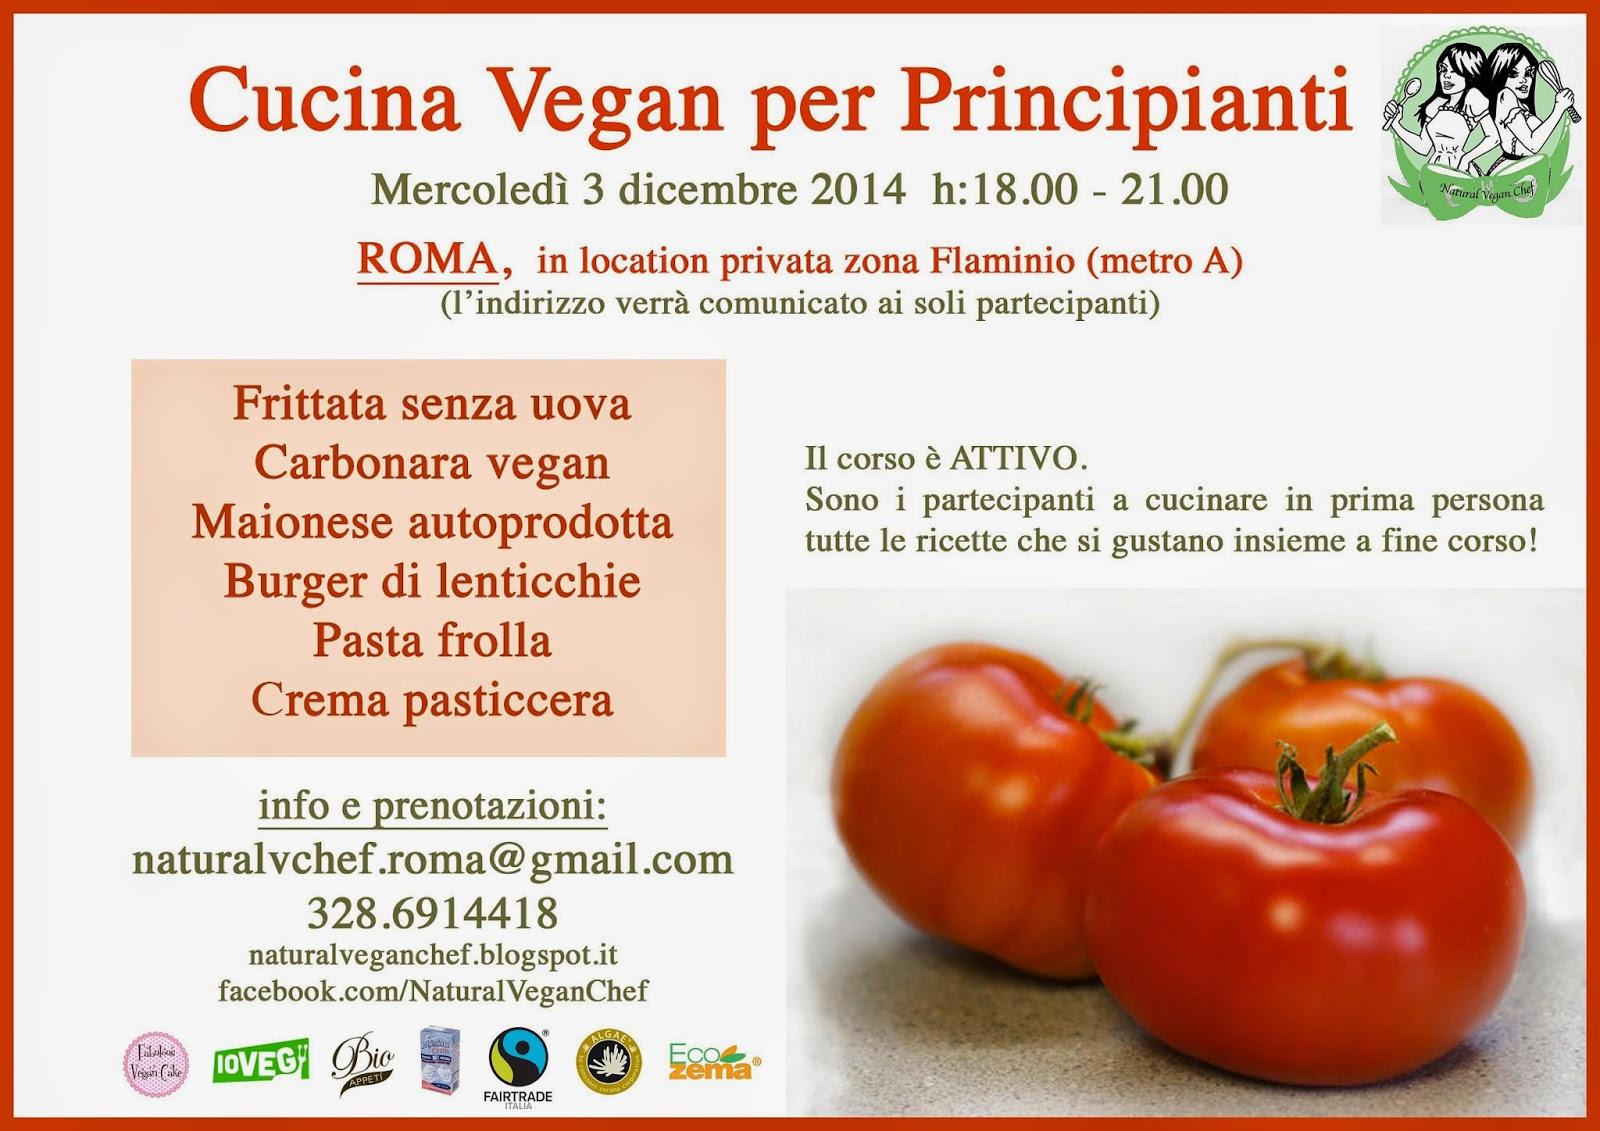 corso di cucina cucina vegan per principianti a roma